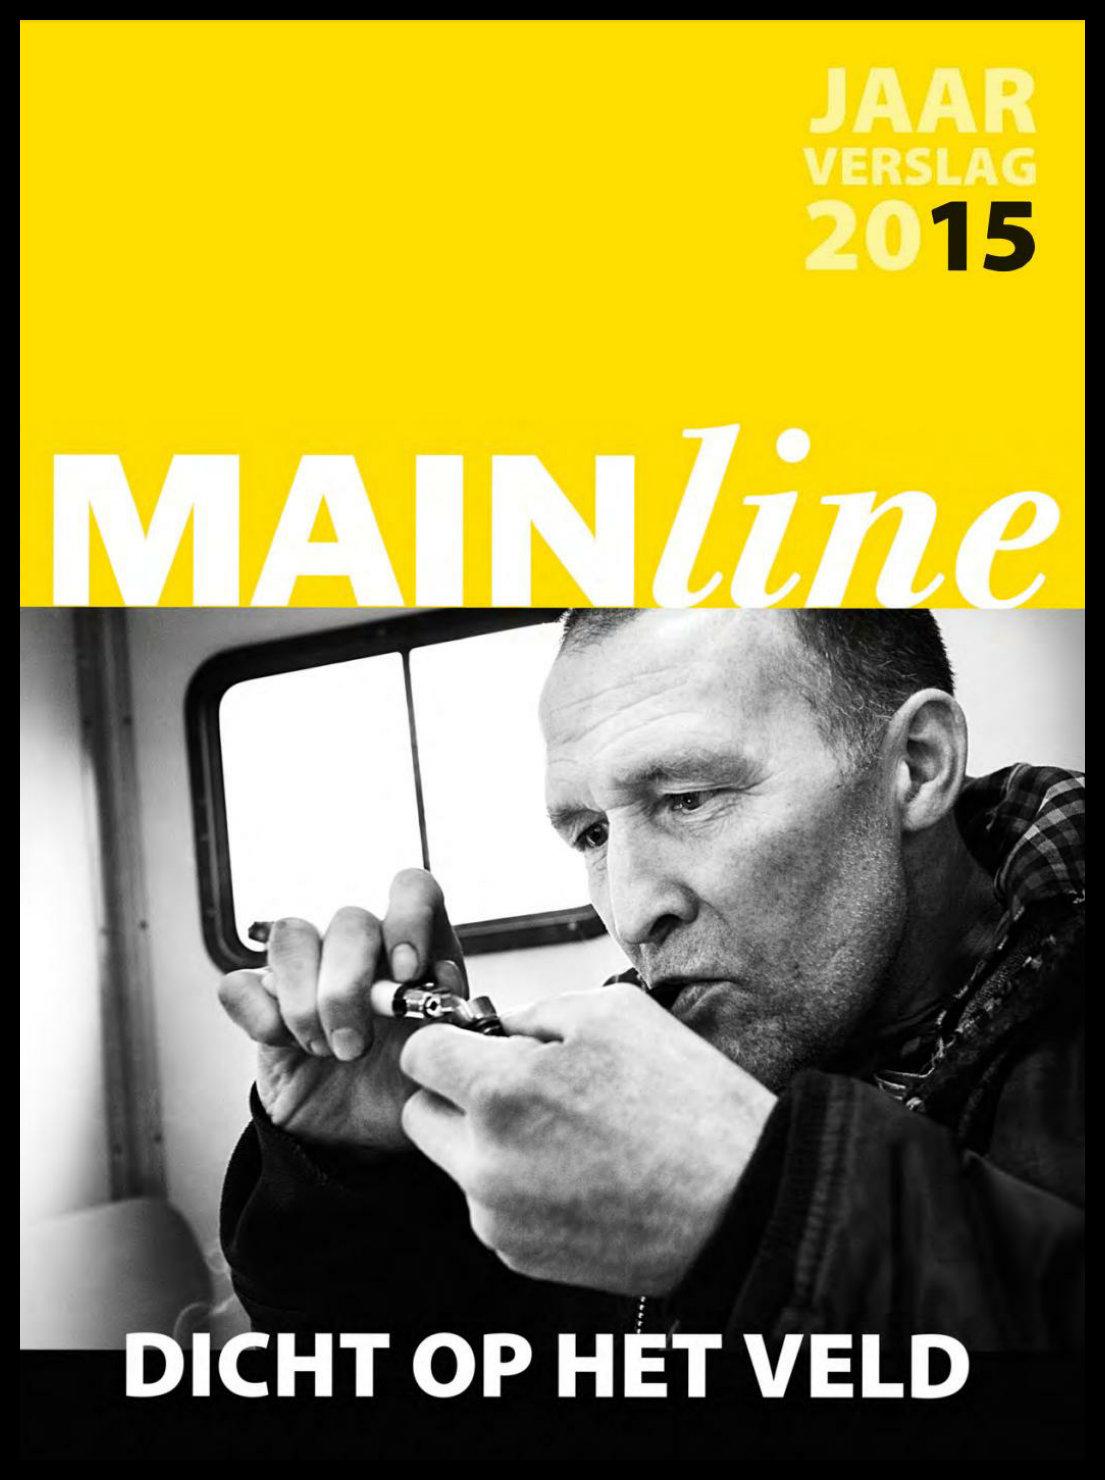 Mainline 2015